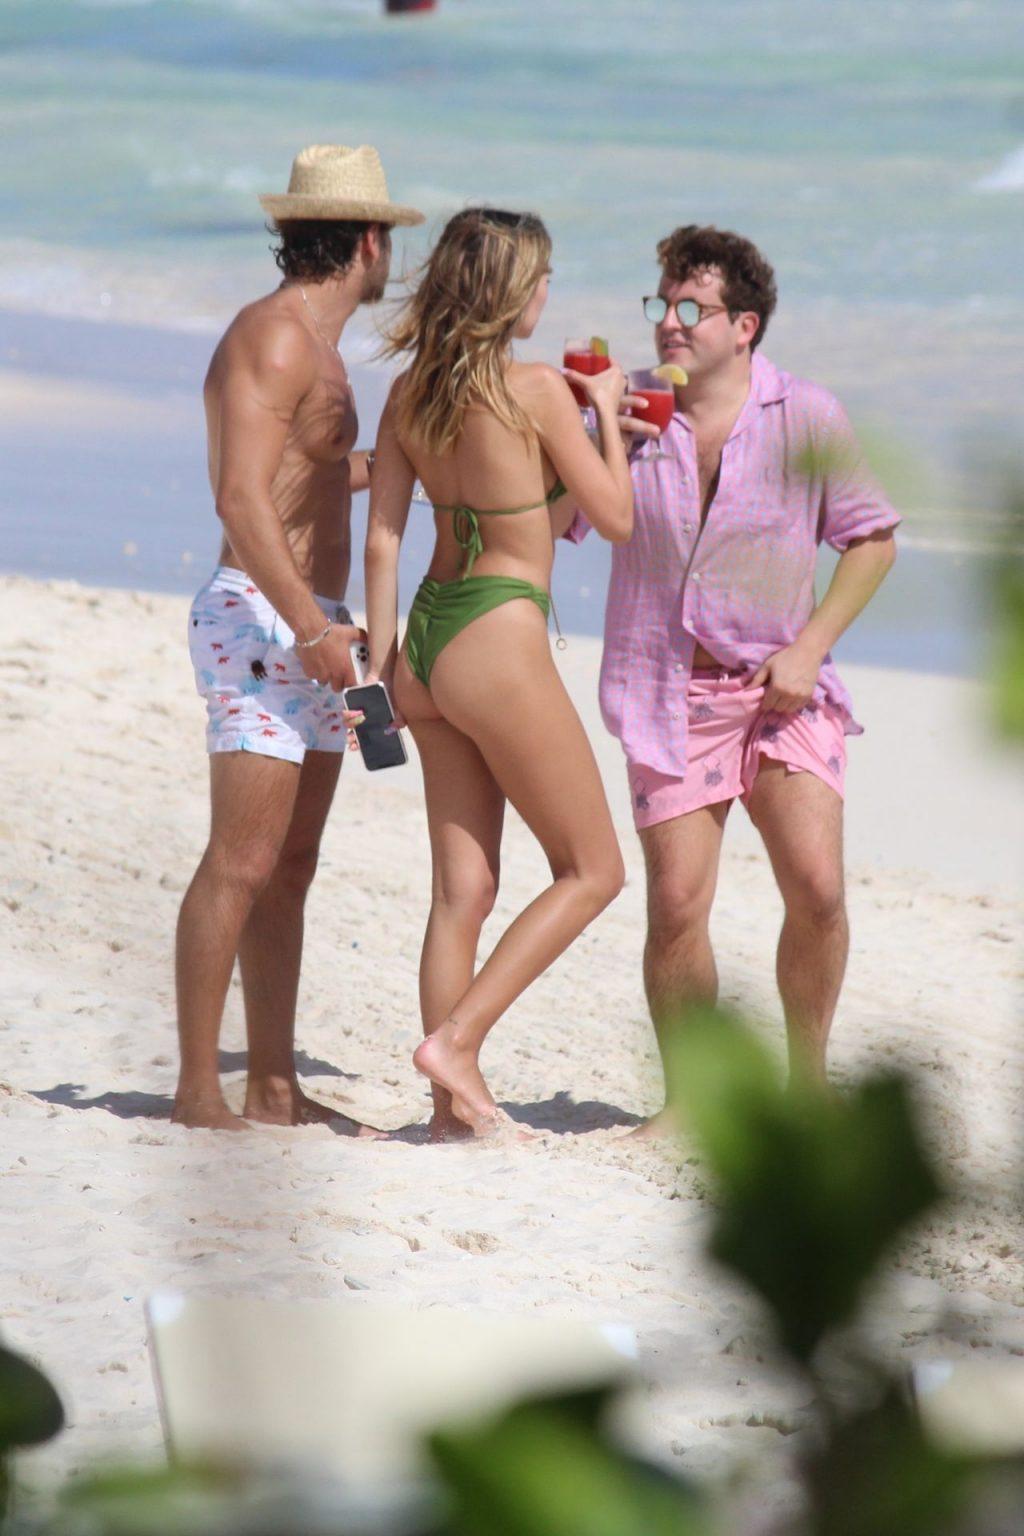 Delilah Belle Hamlin Shows Off Her Toned Figure in a Green Bikini (35 Photos)